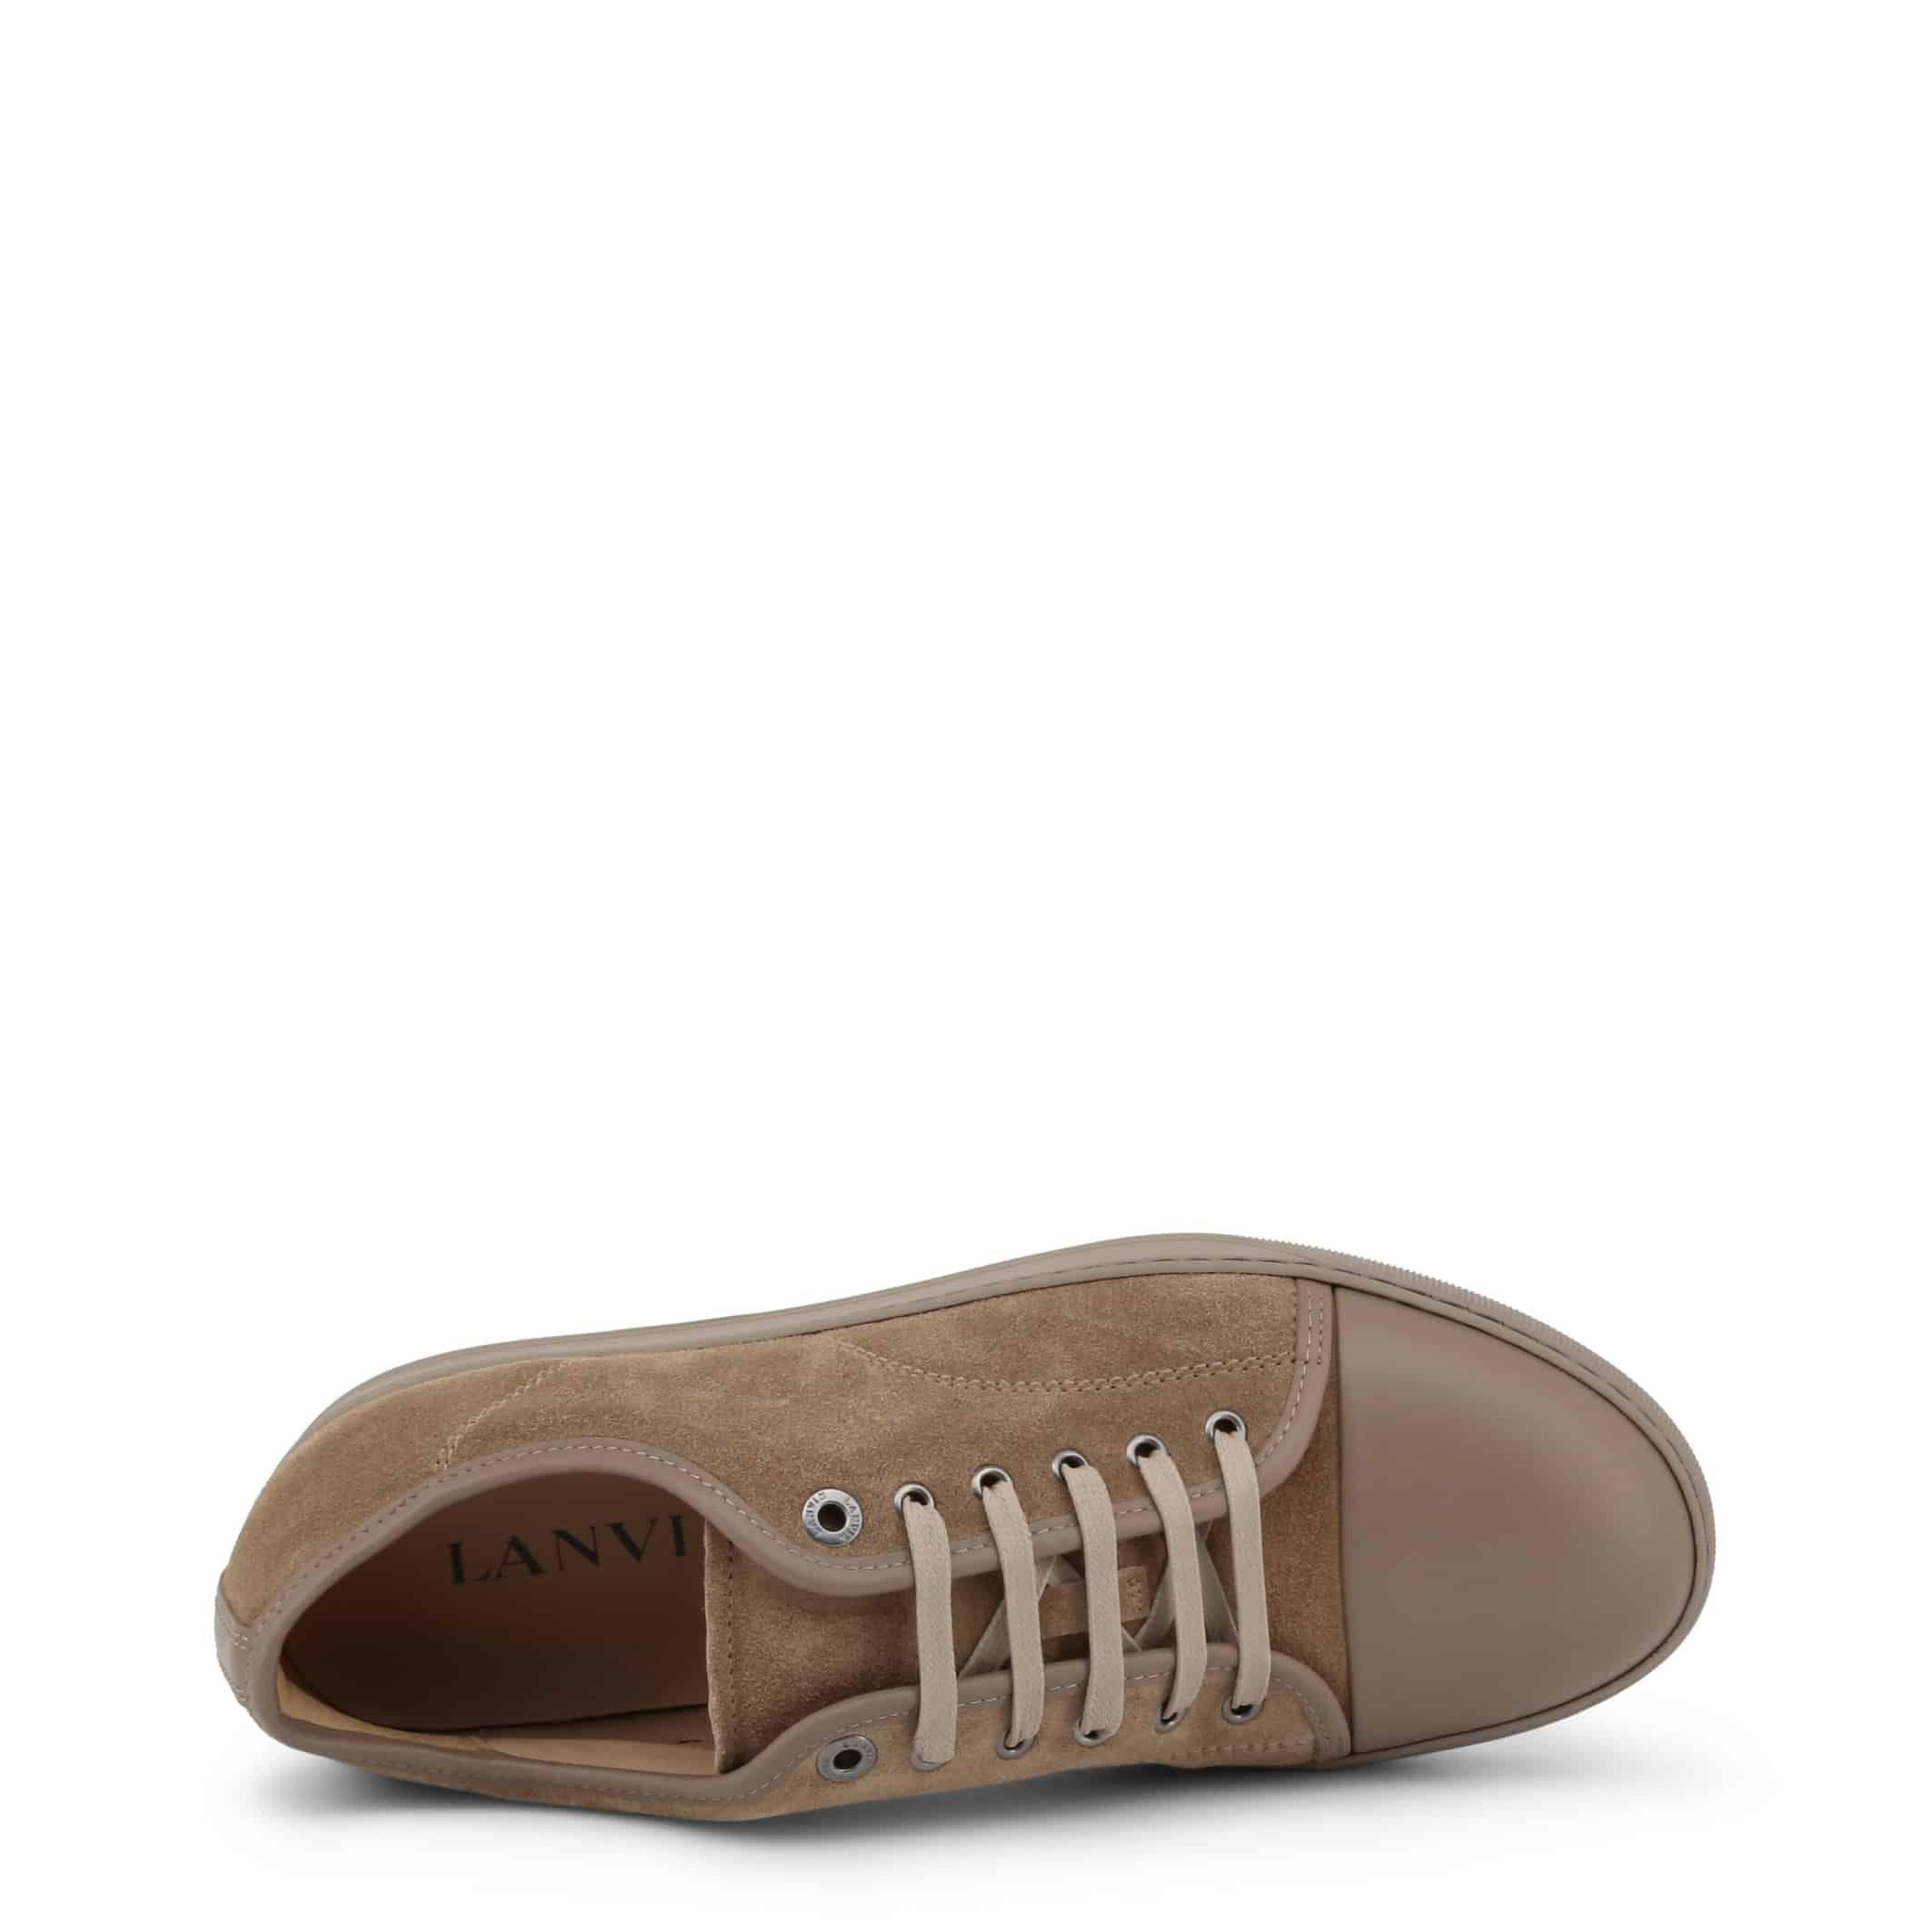 Sneakers Lanvin – FM-SKDBB1-ANAM-P16